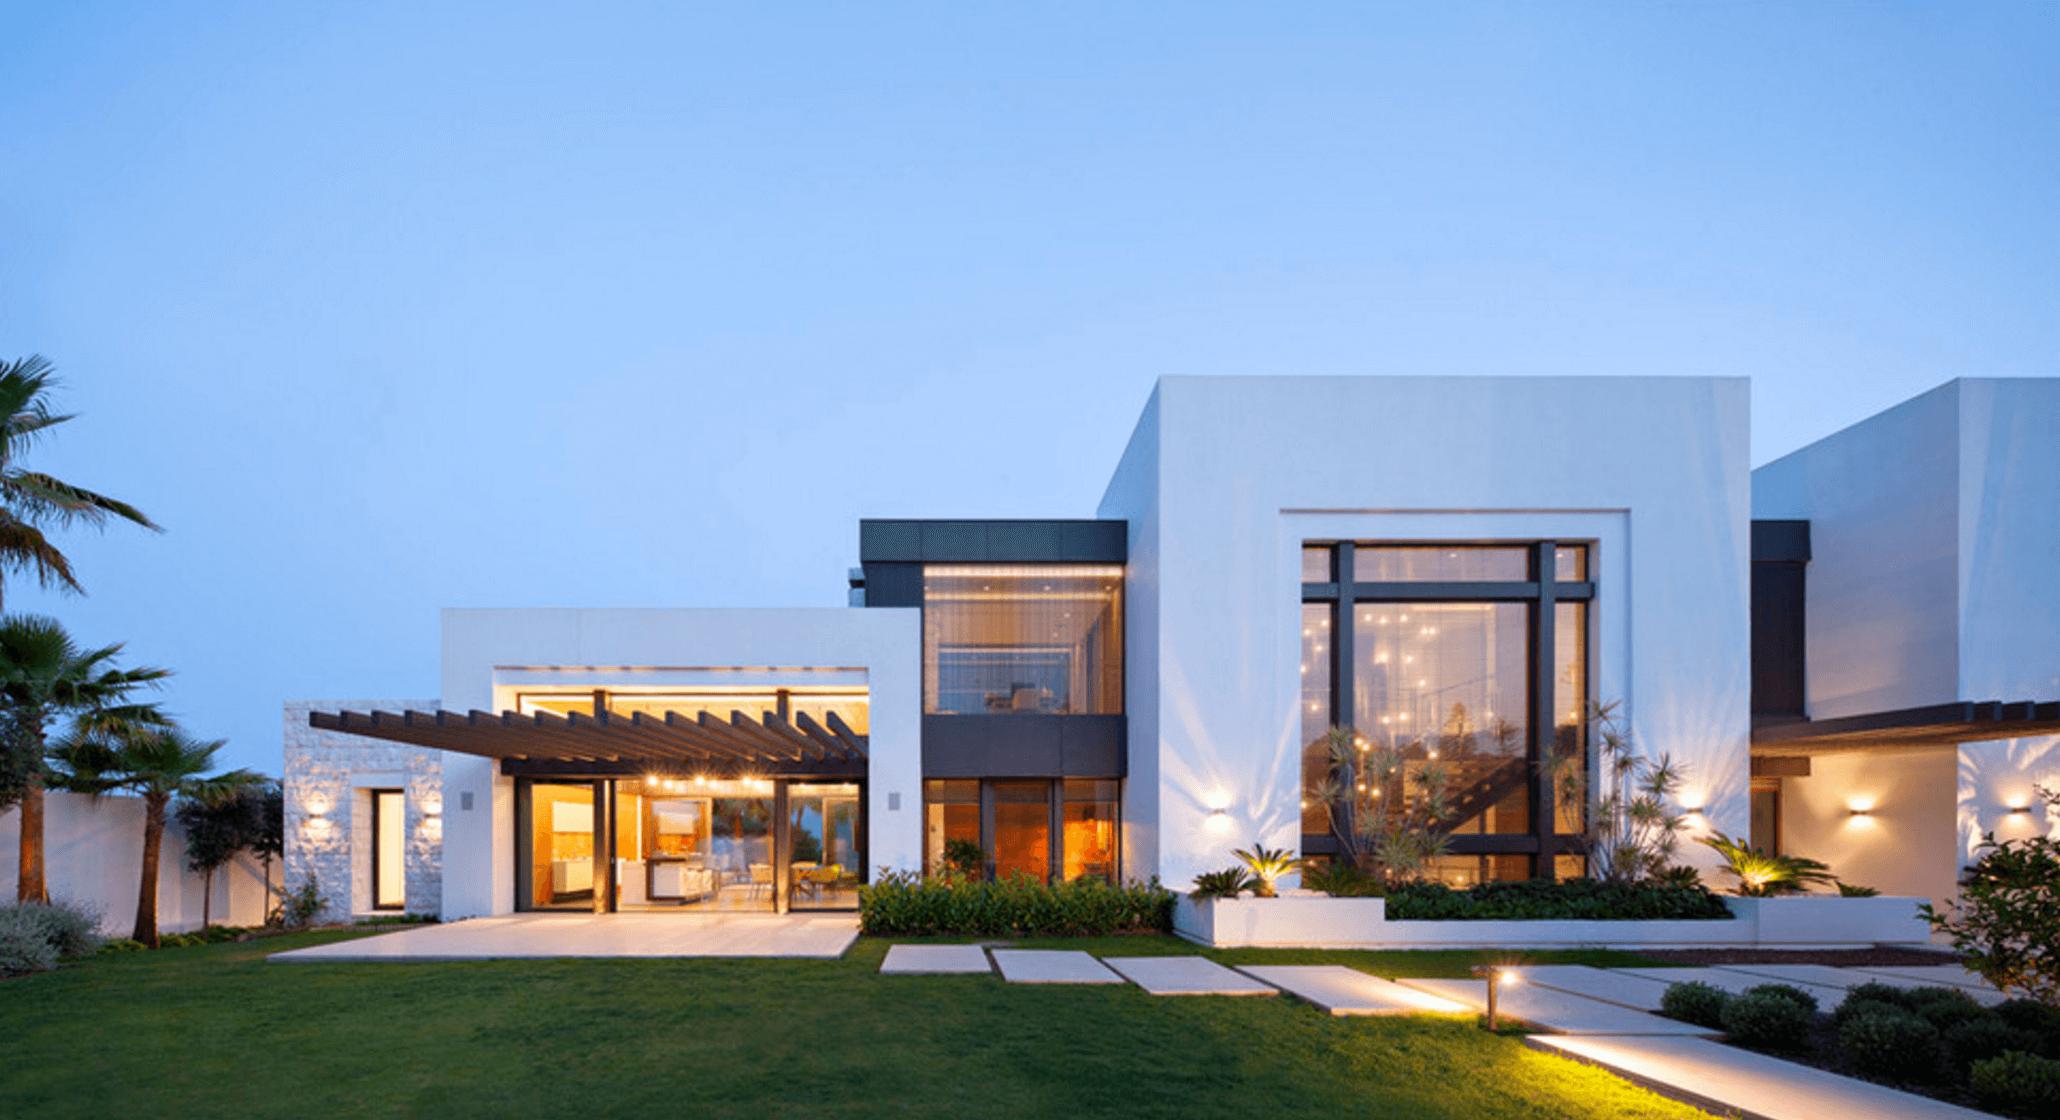 10 White Exterior Ideas For A Bright Modern Home Beach House